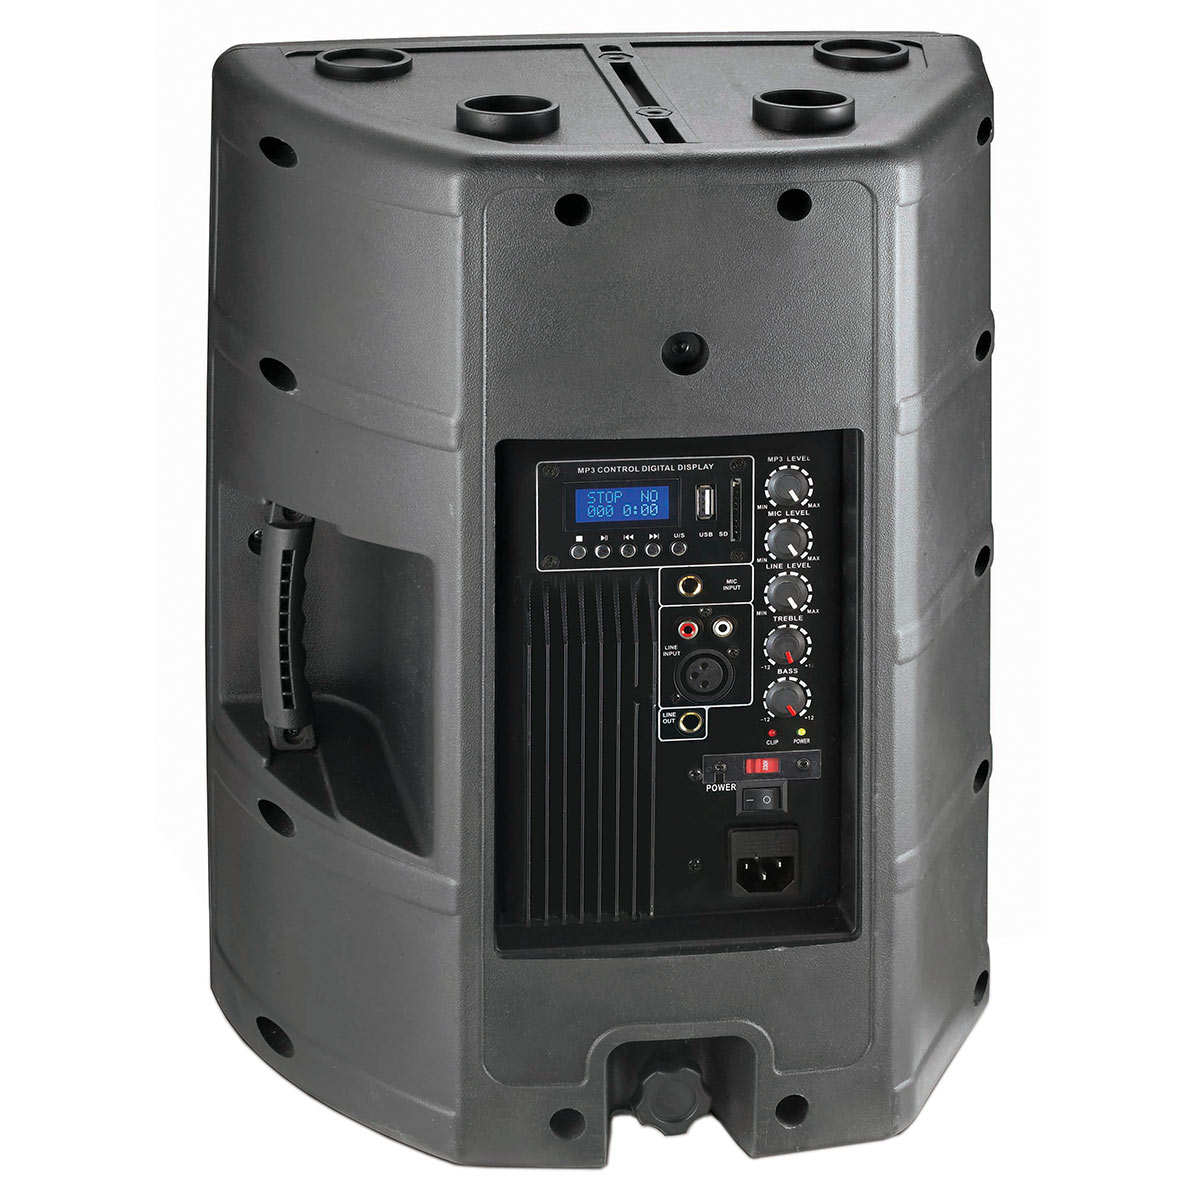 EVO250AUSB - Caixa Ativa 250W c/ USB EVO 250 A USB - Novik Neo